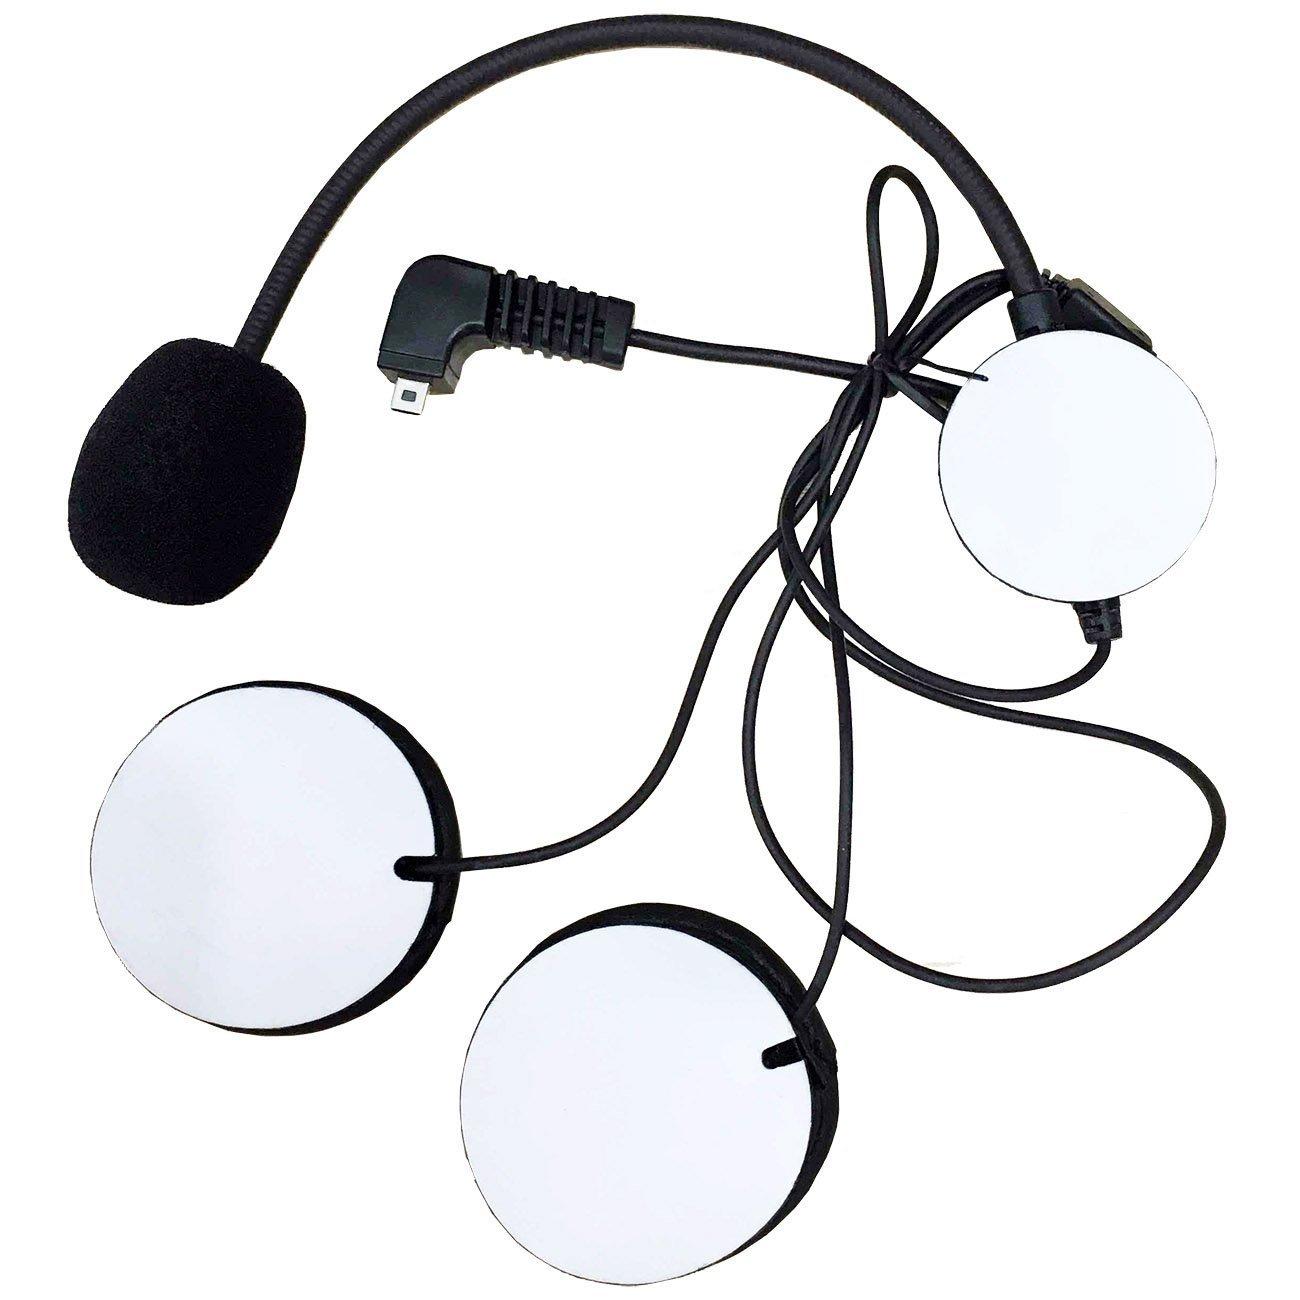 BT-S2/Casque Intercom pour moto avec microphone